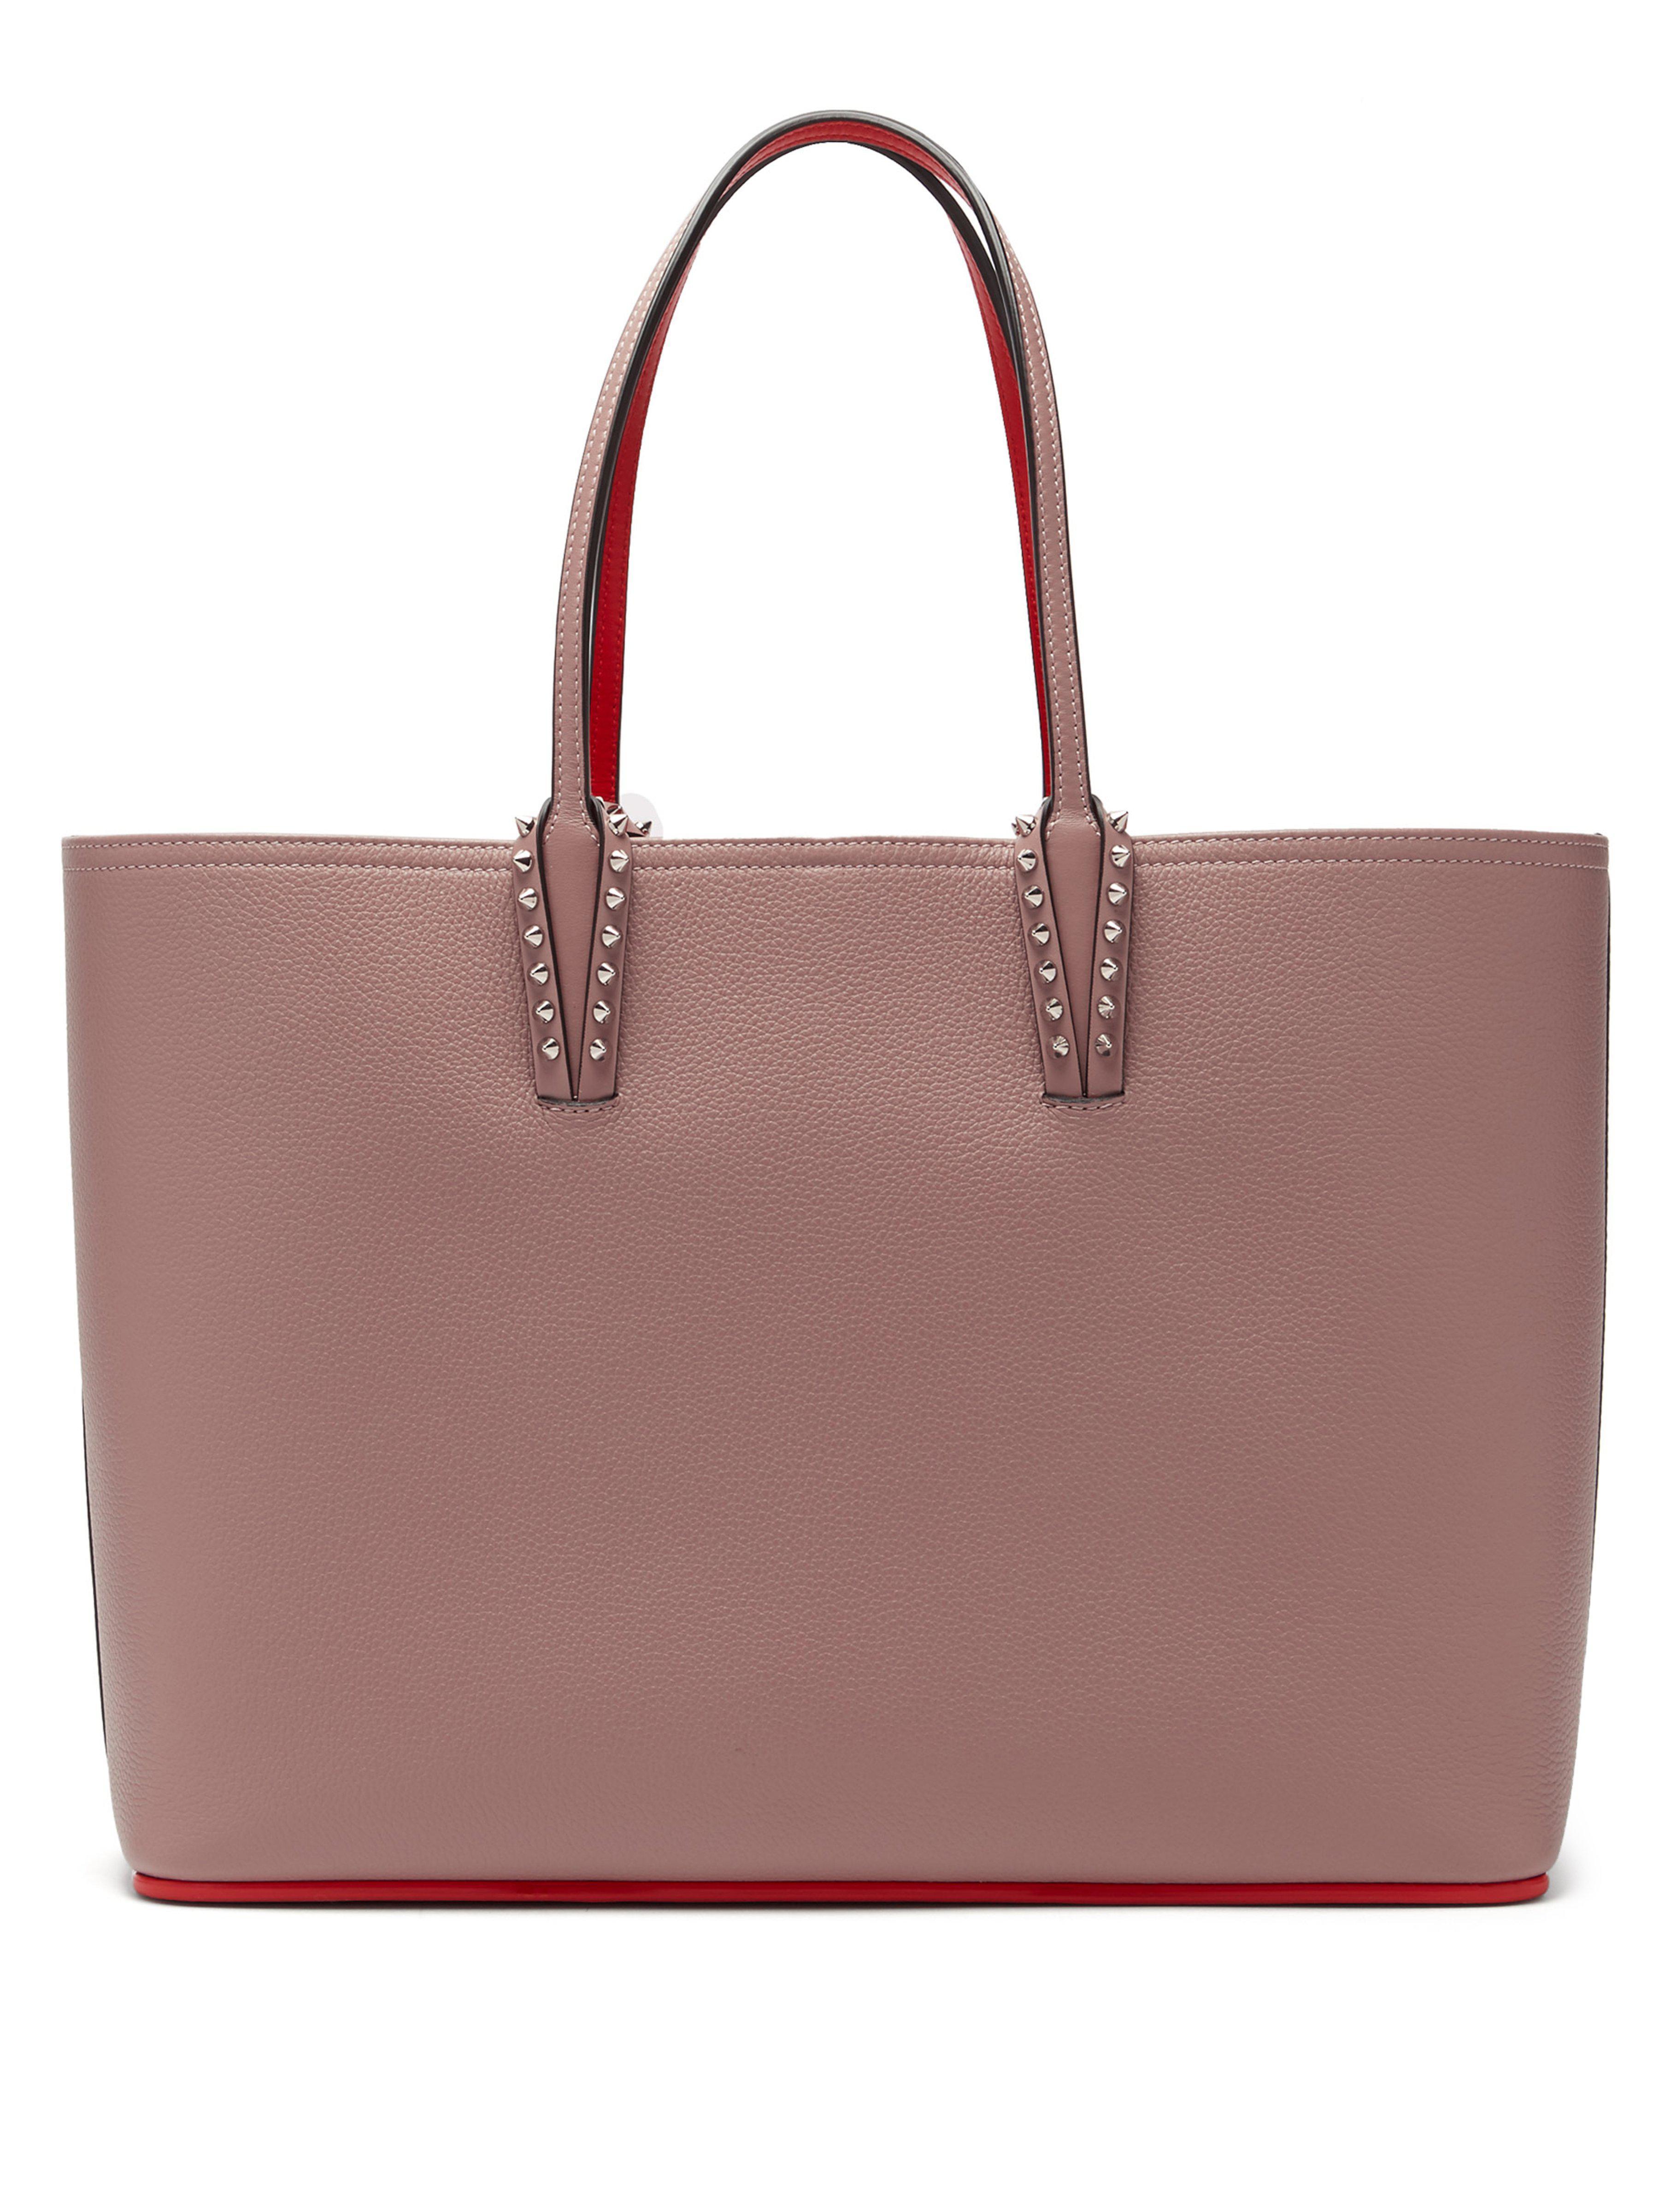 549ebbb2da21 Christian Louboutin Cabata Spike Embellished Tote Bag in Pink - Lyst